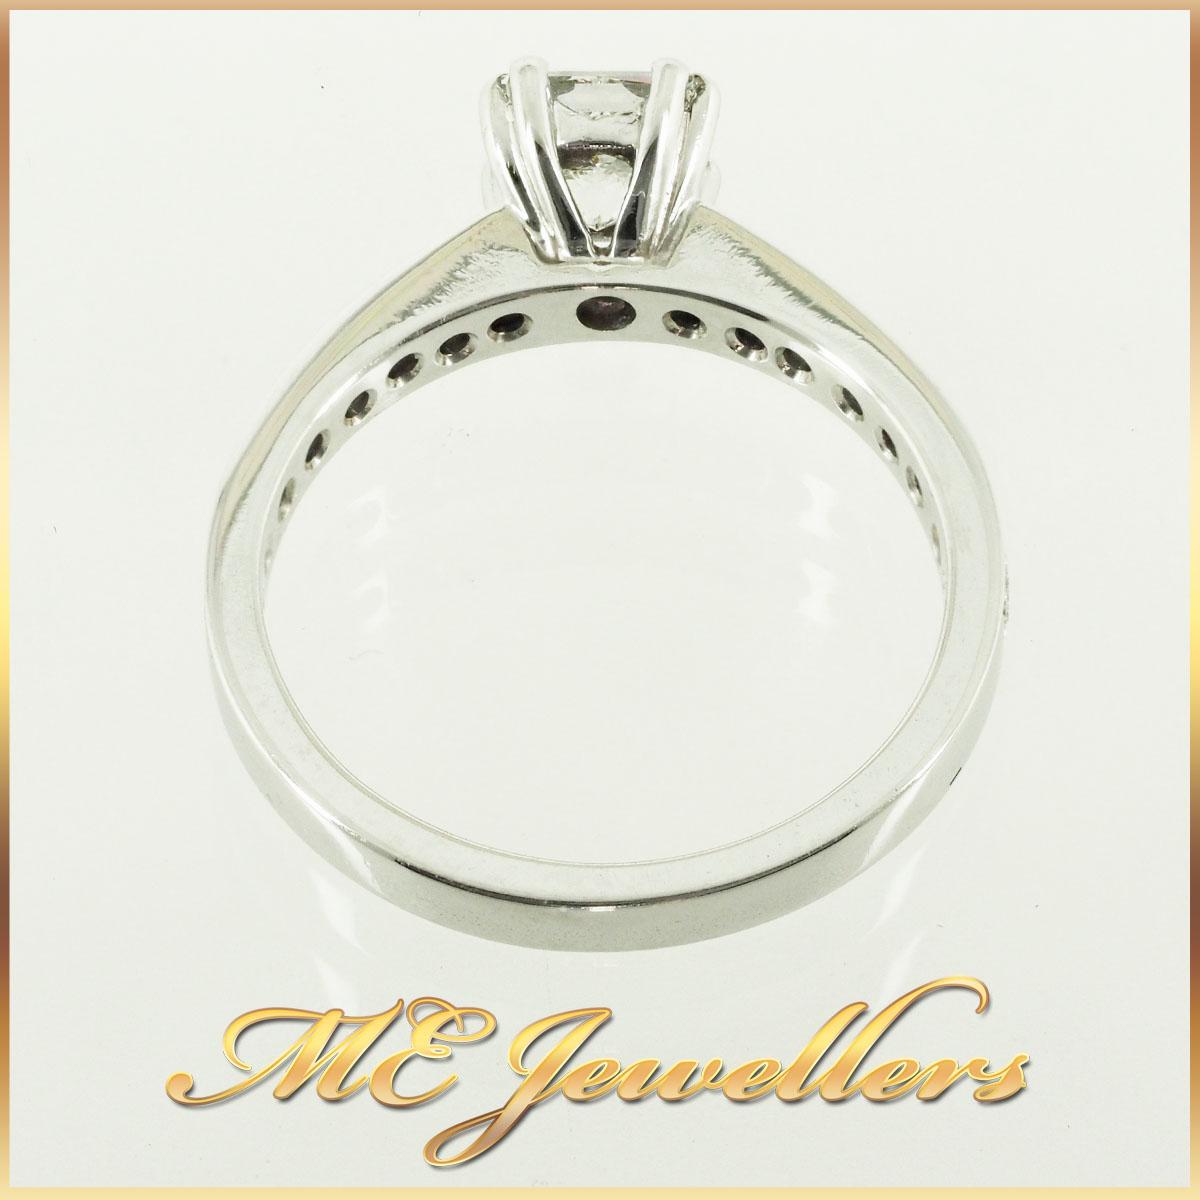 6361_gia-square-diamond-engagement-ring-18k-white-gold-1